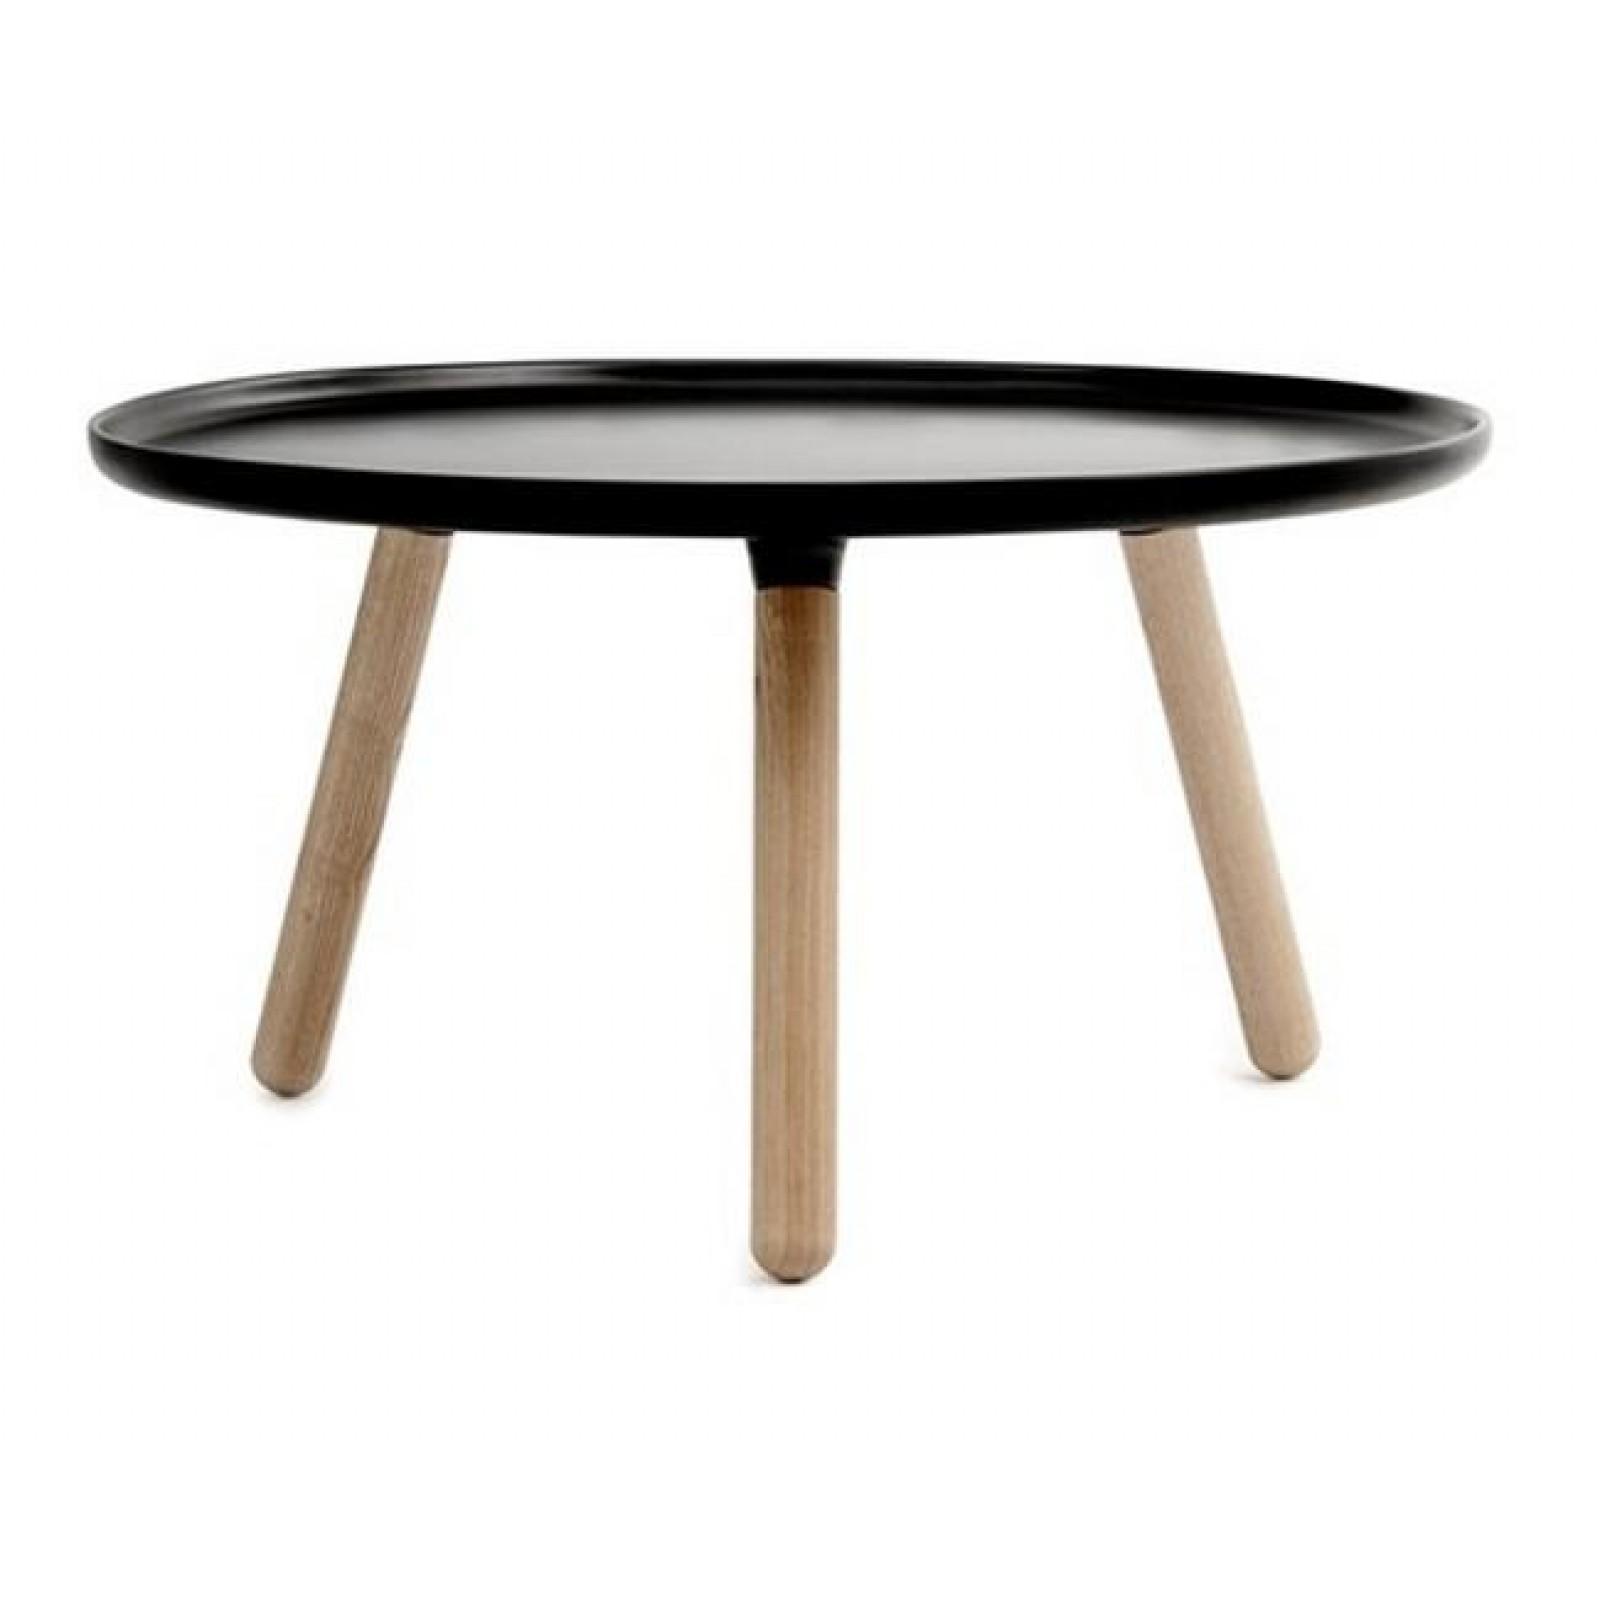 Tablo Large Table - Normann Copenhagen